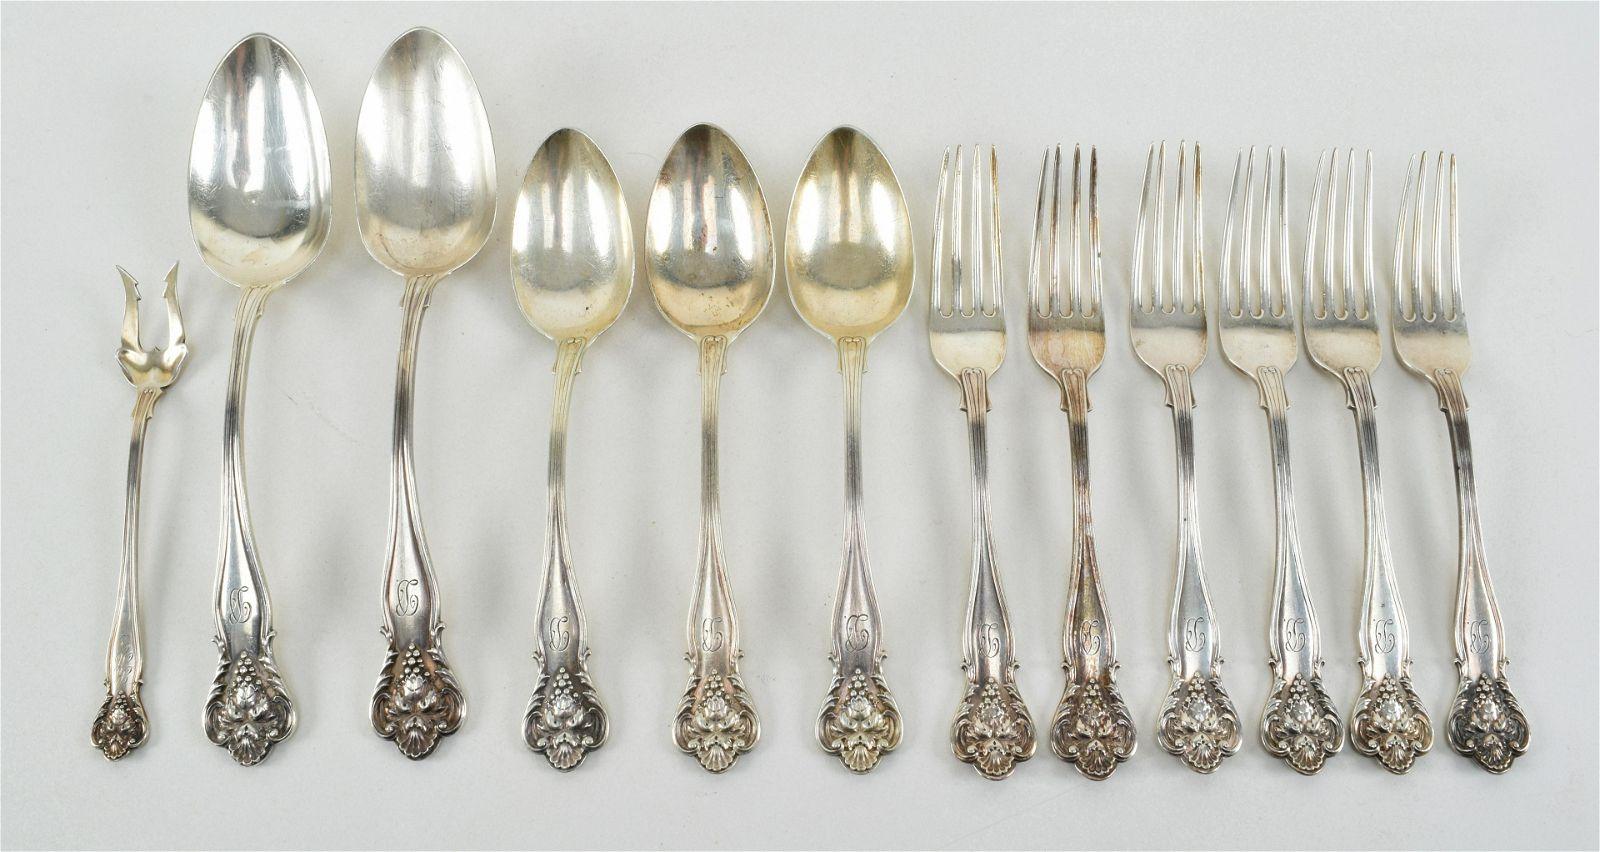 William Durgin art nouveau sterling silver flatware.